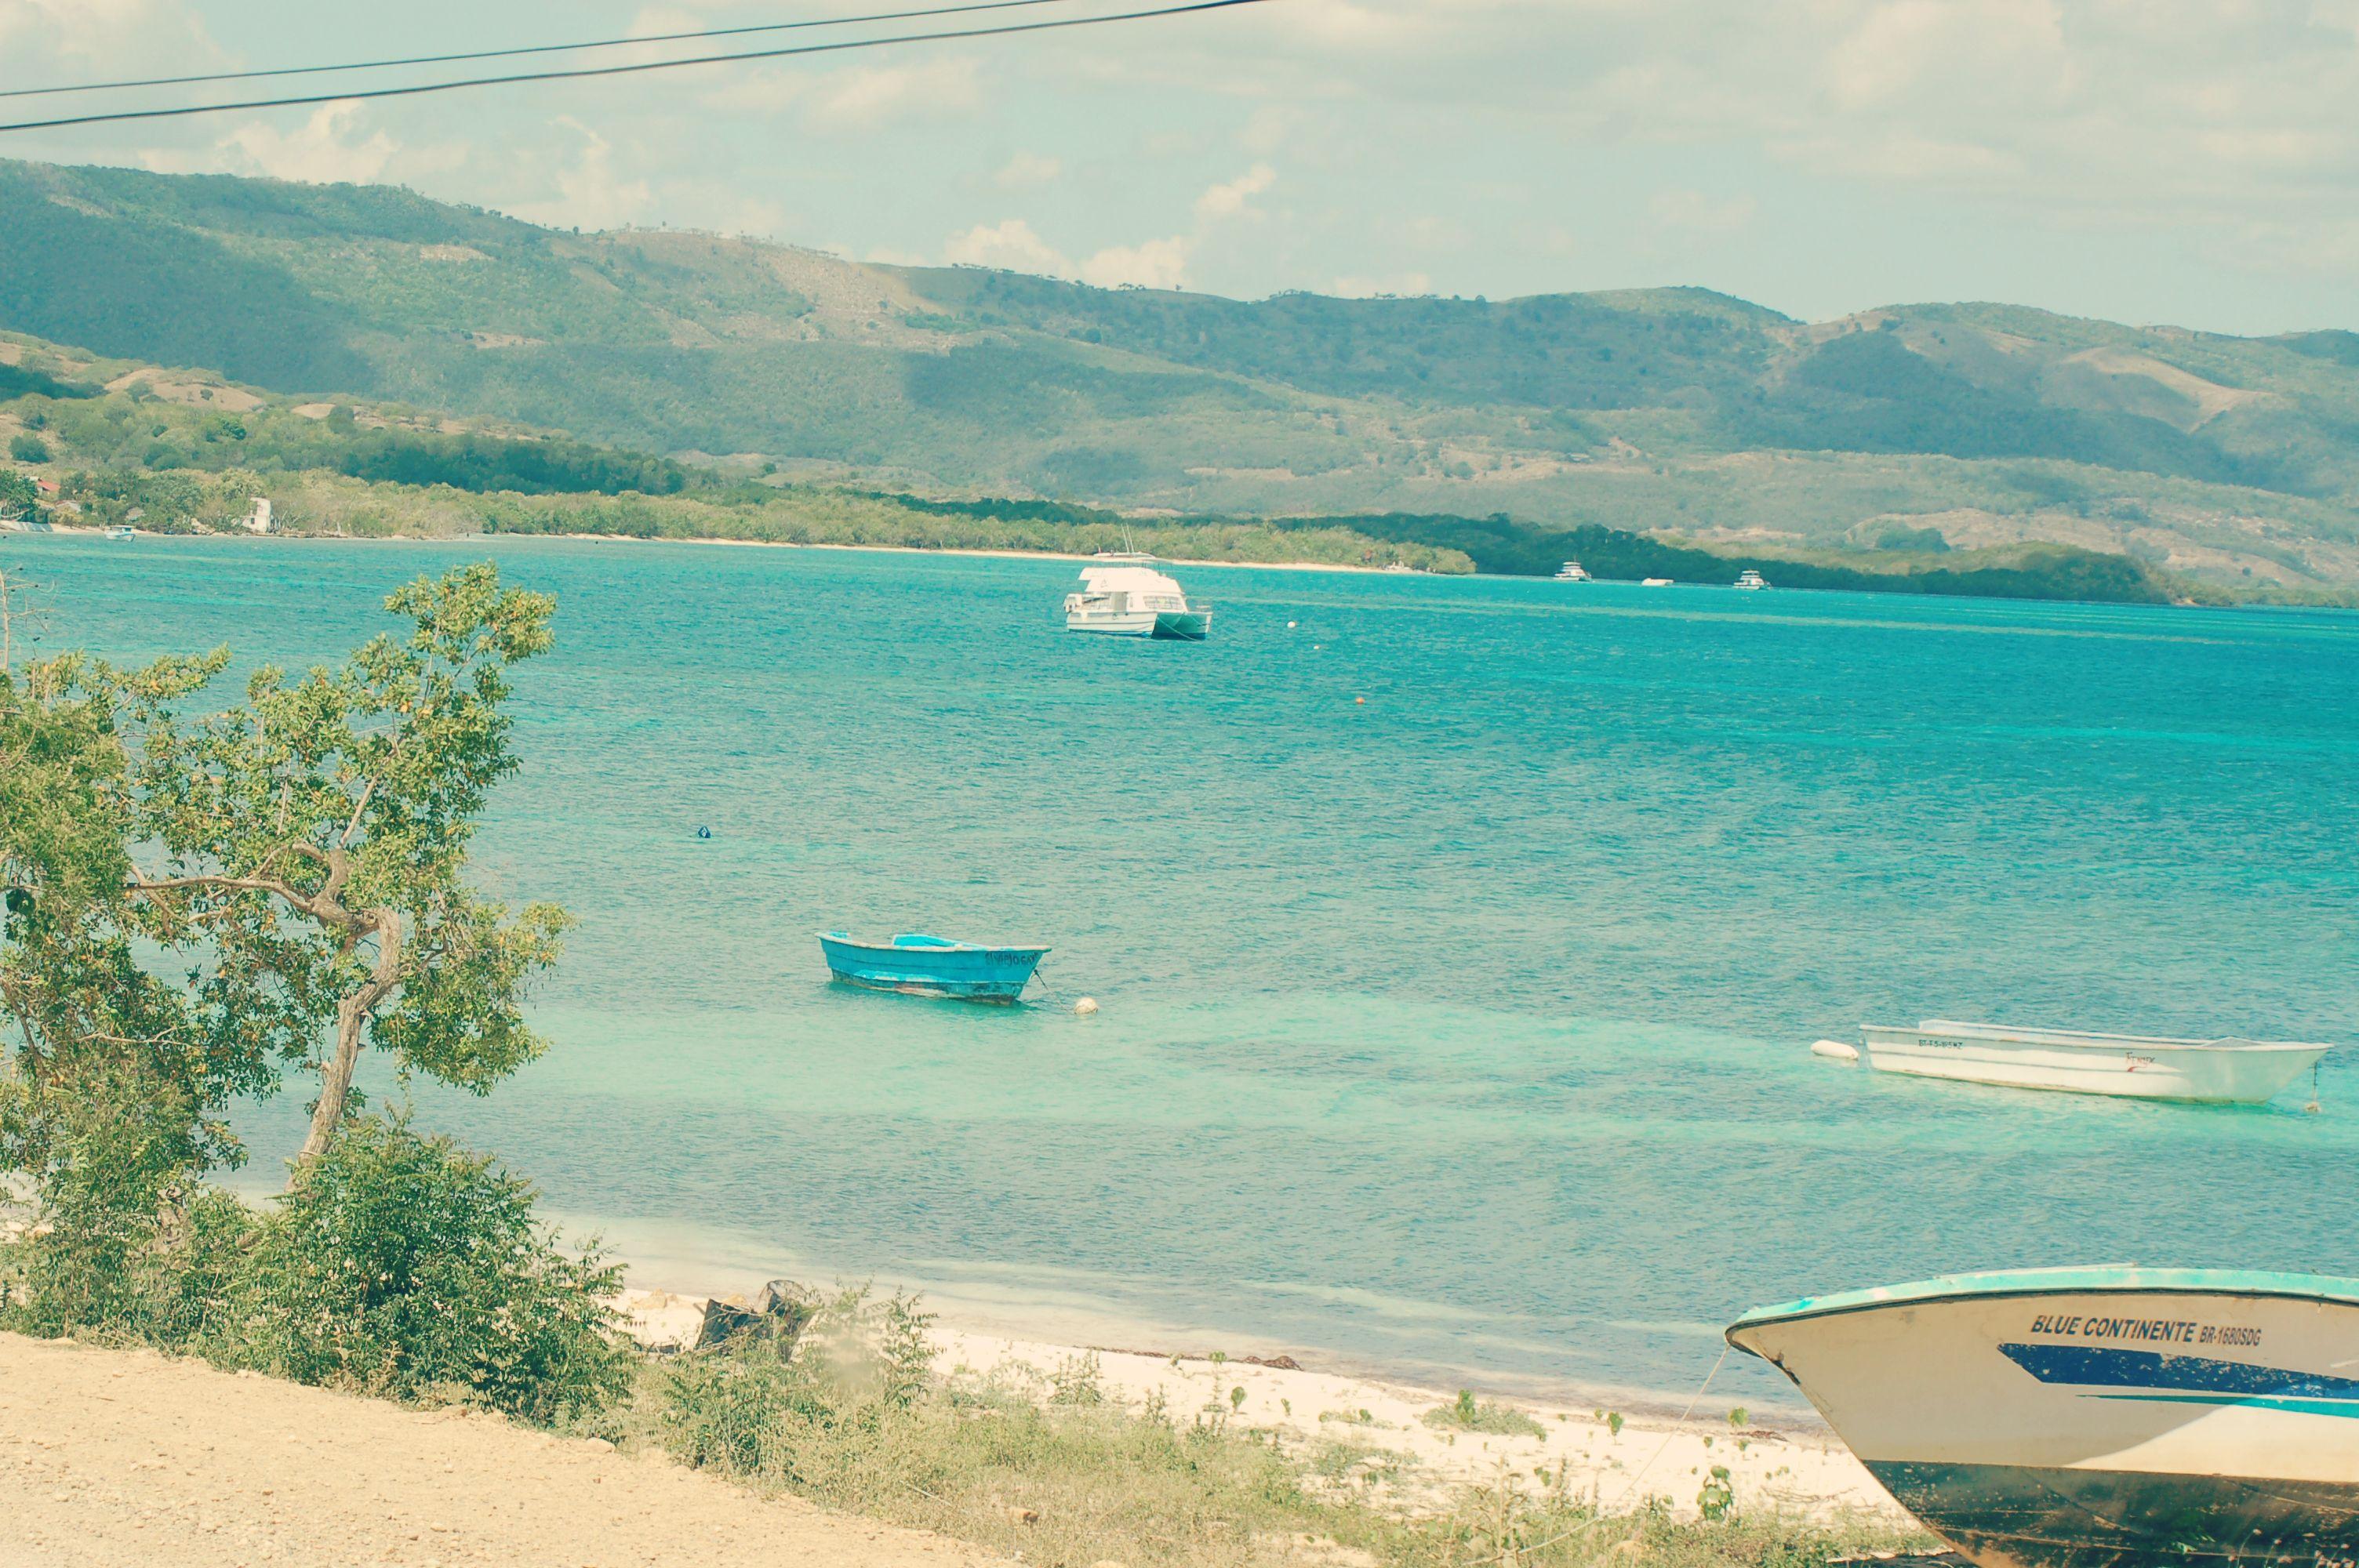 Vista de la costa en Punta Rucia, República Dominicana.